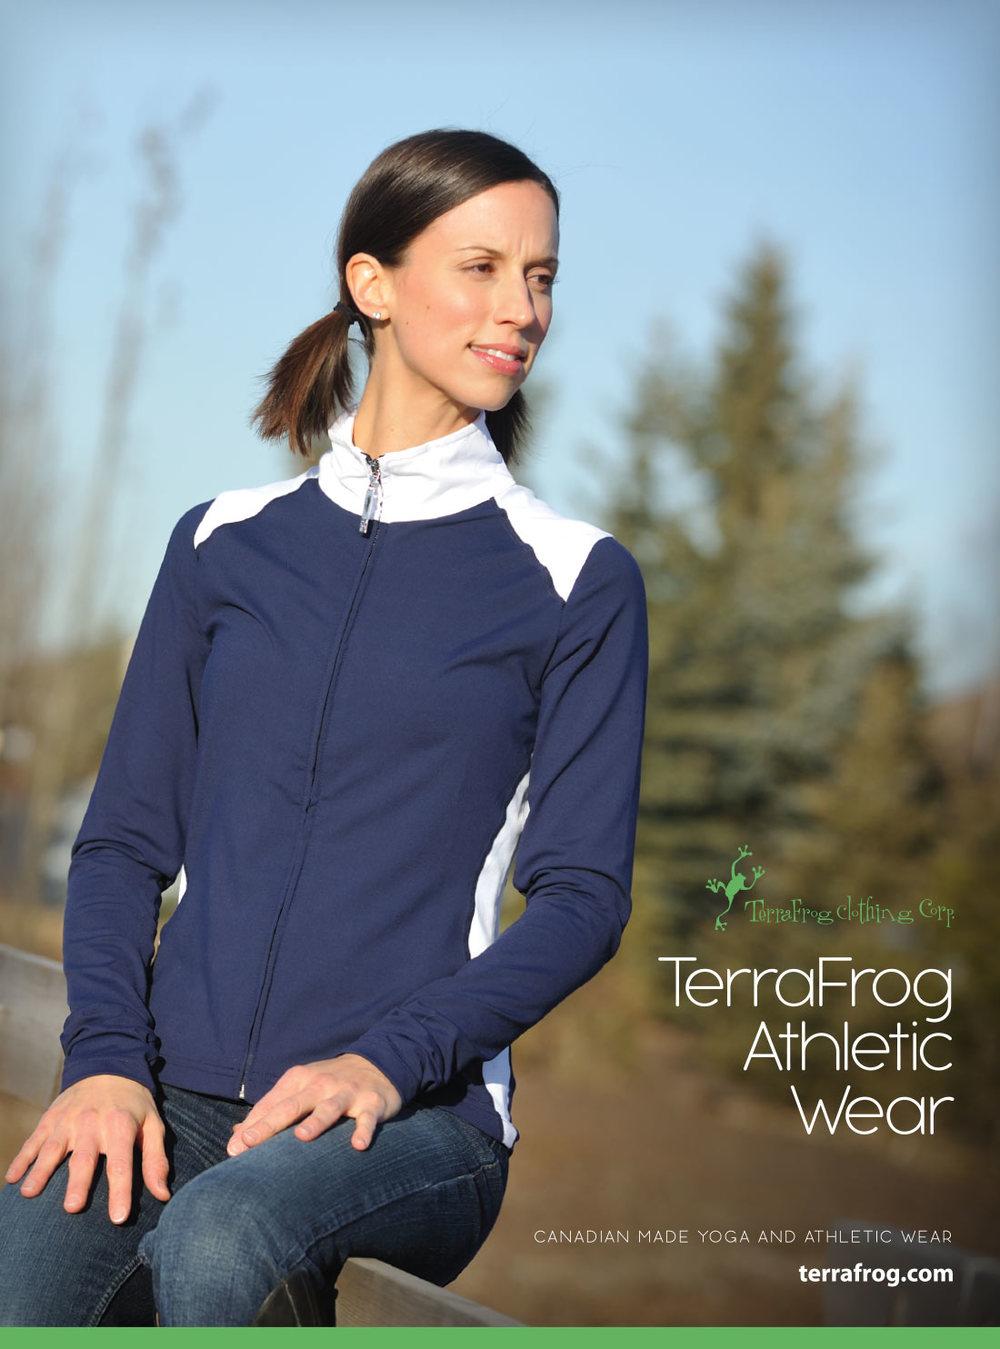 terrafrog_QC-ad_full-page_20140825.jpg